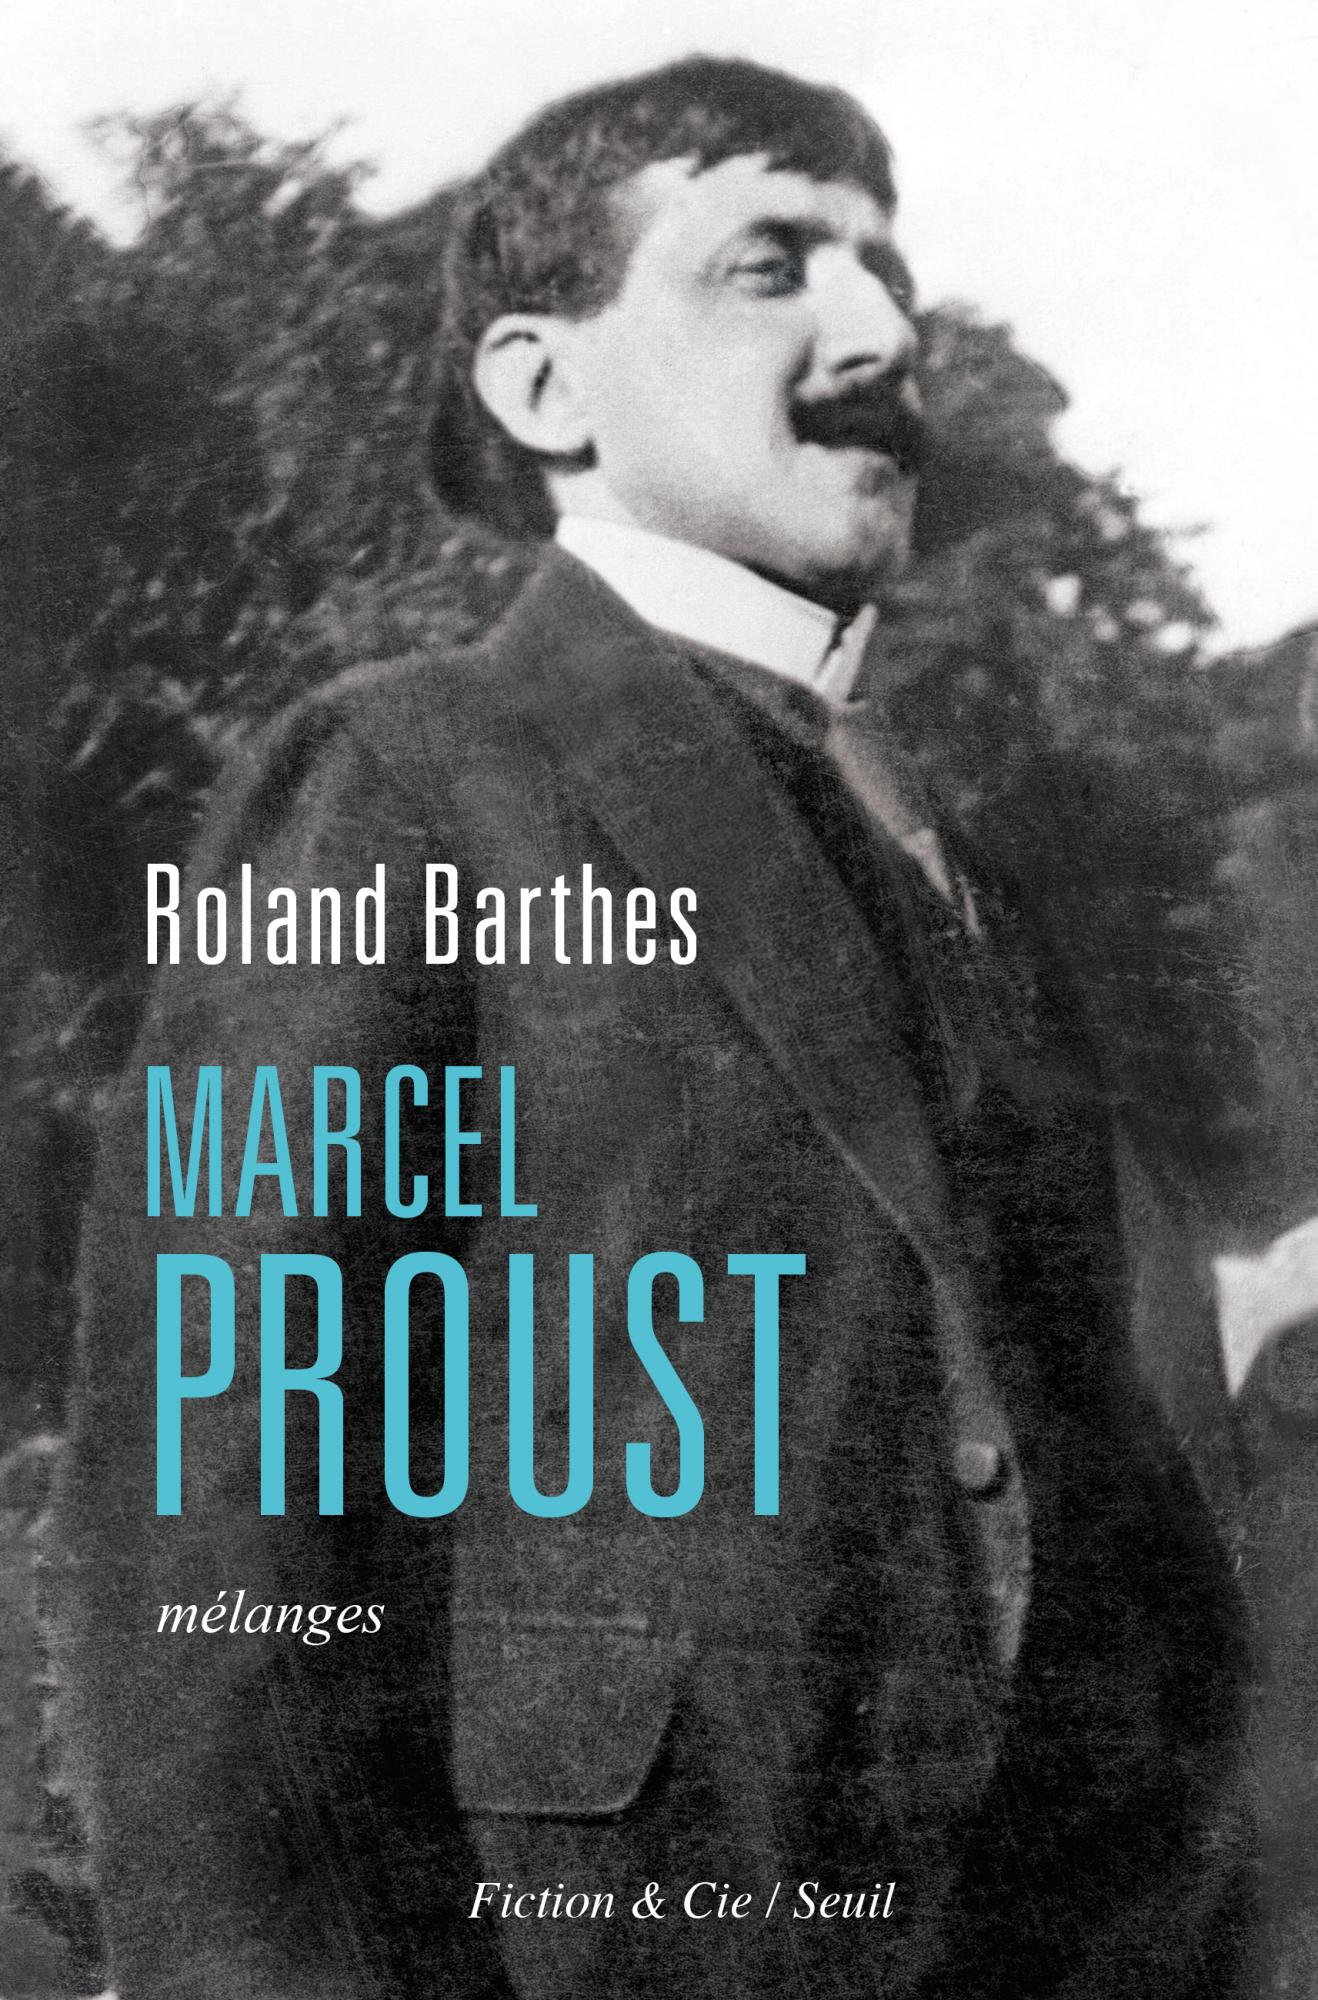 R. Barthes,Marcel Proust. Mélanges(anthologie)